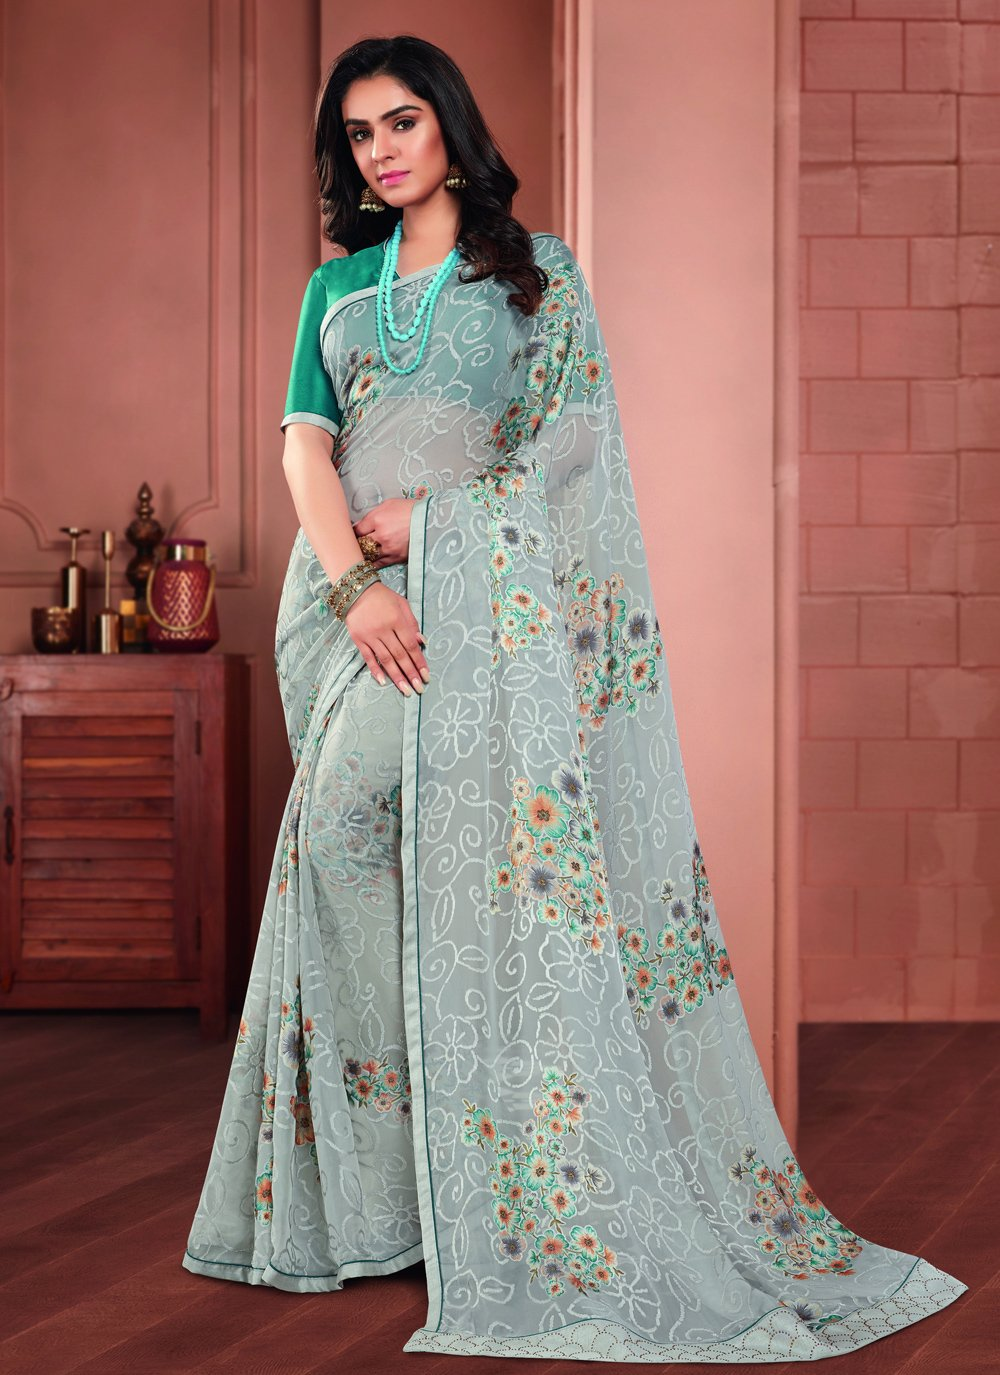 Tissue Printed Saree in Blue